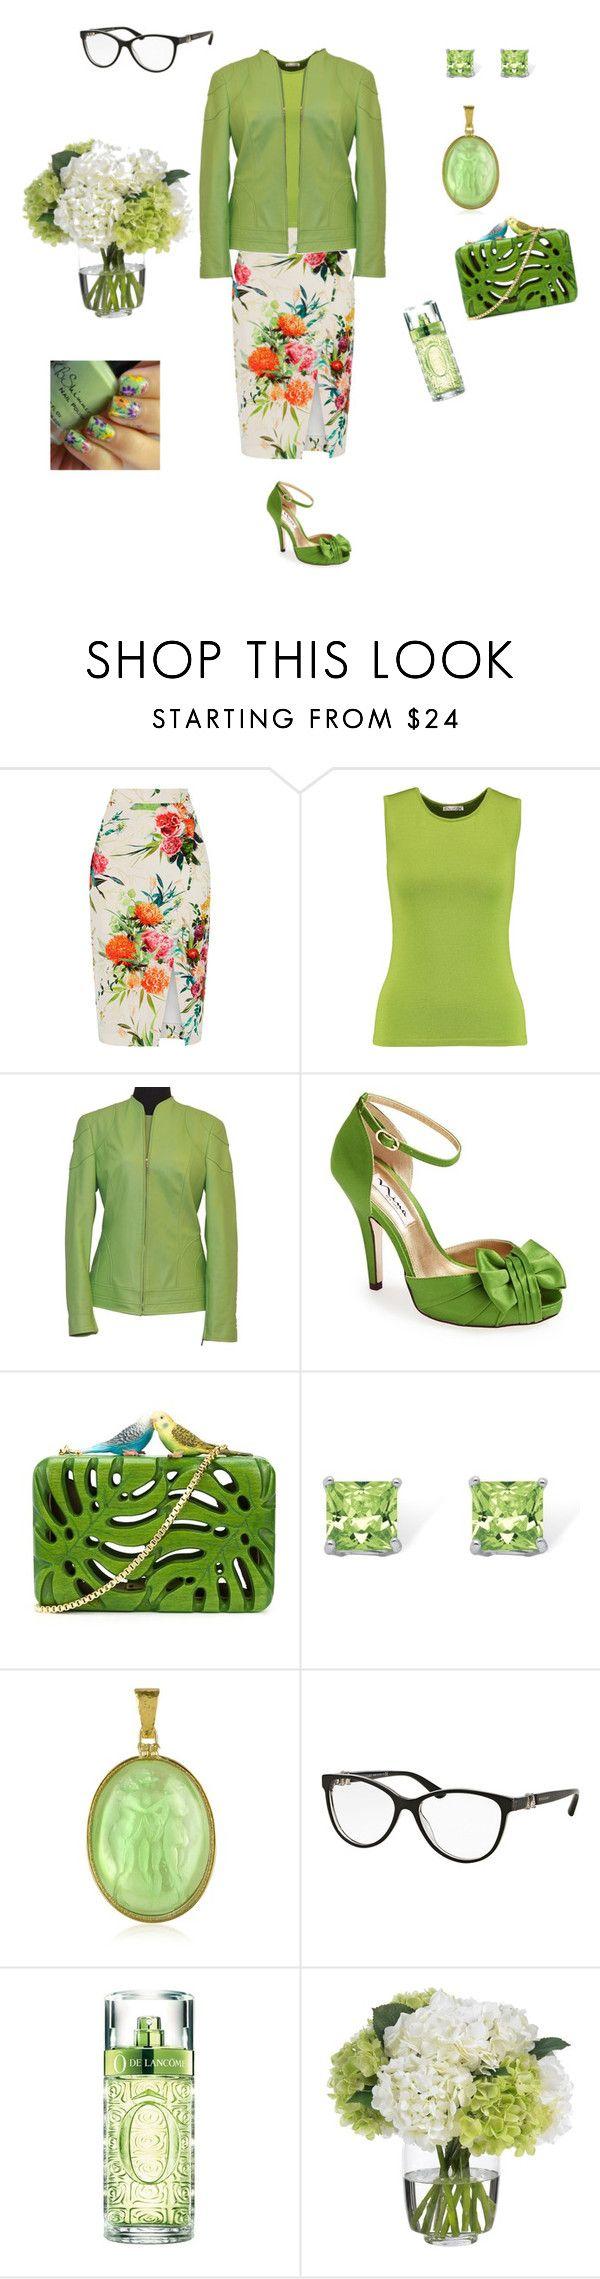 """Spring Green"" by kitty-hiruma ❤ liked on Polyvore featuring Oasis, Oscar de la Renta, ESCADA, Nina, Sarah's Bag, Palm Beach Jewelry, Tagliamonte, Bulgari, Lancôme and Diane James"